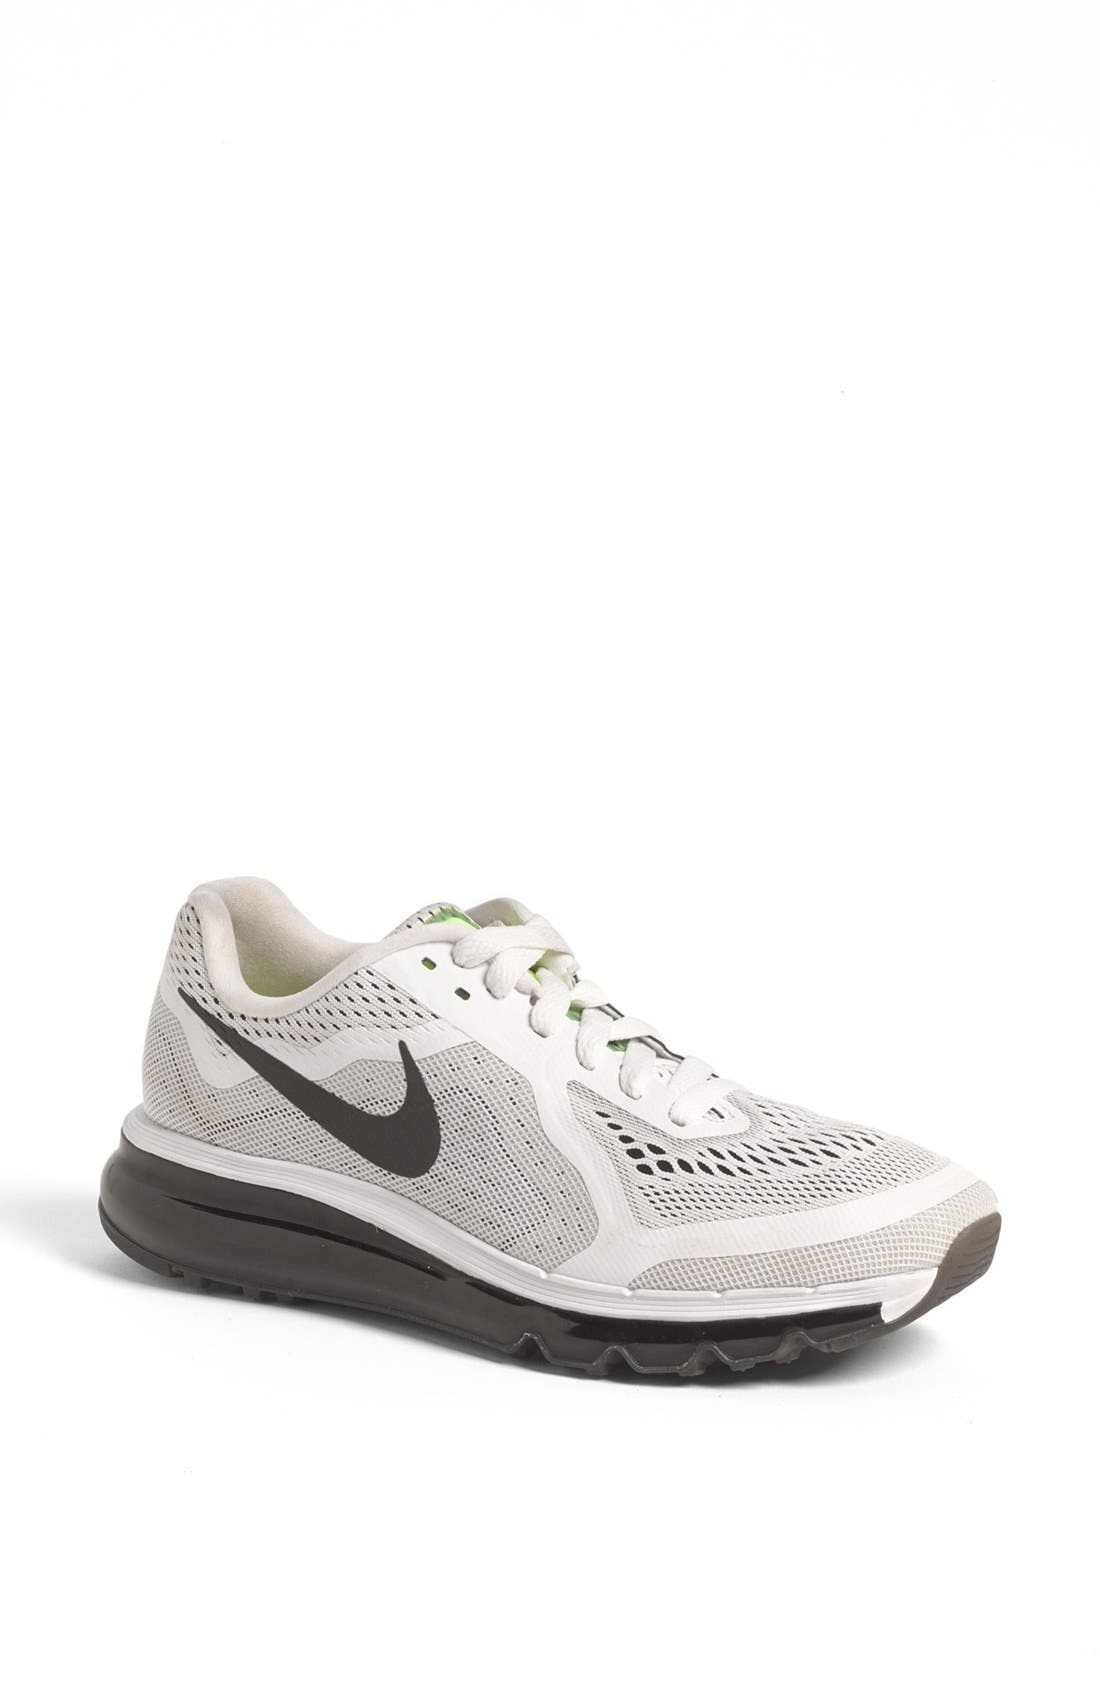 Main Image - Nike 'Air Max 2014' Running Shoe (Women)